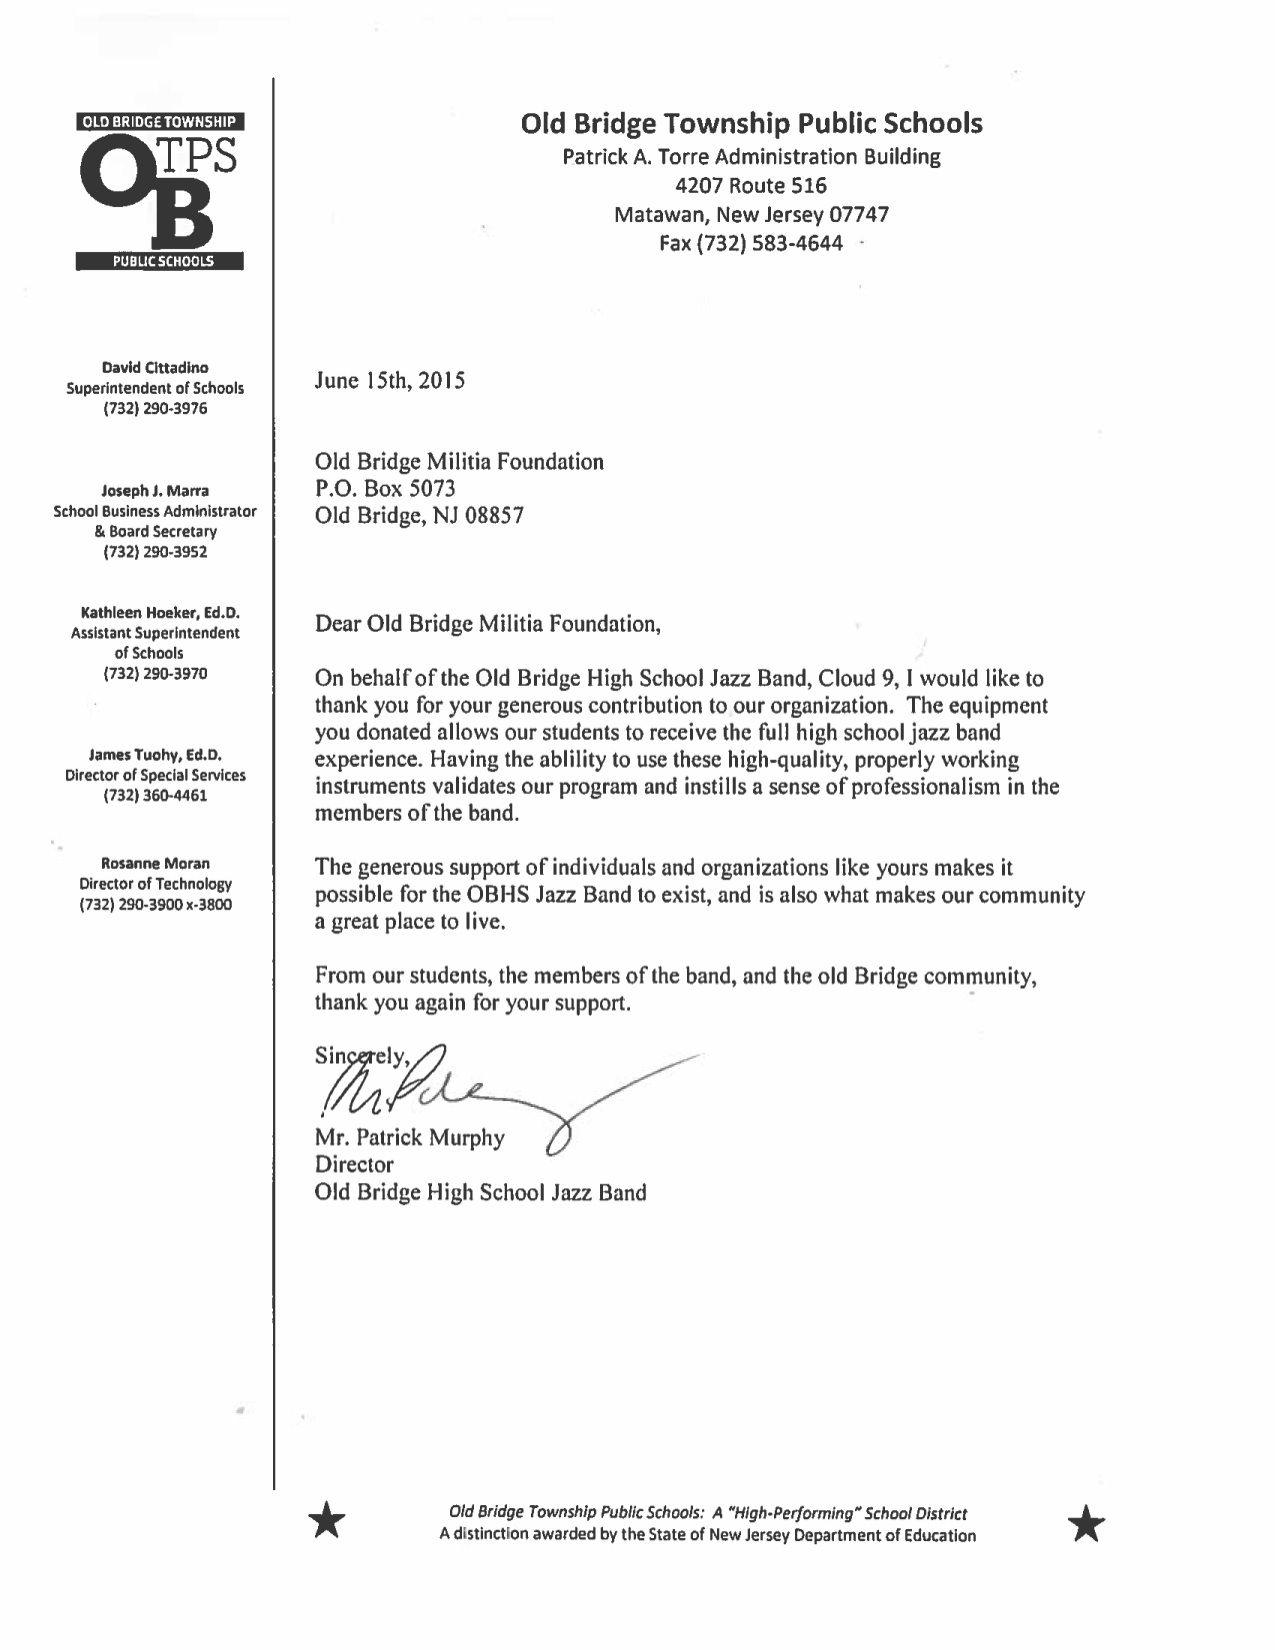 Donation Letter Samplemple For Charity Sample Engagement Sofii